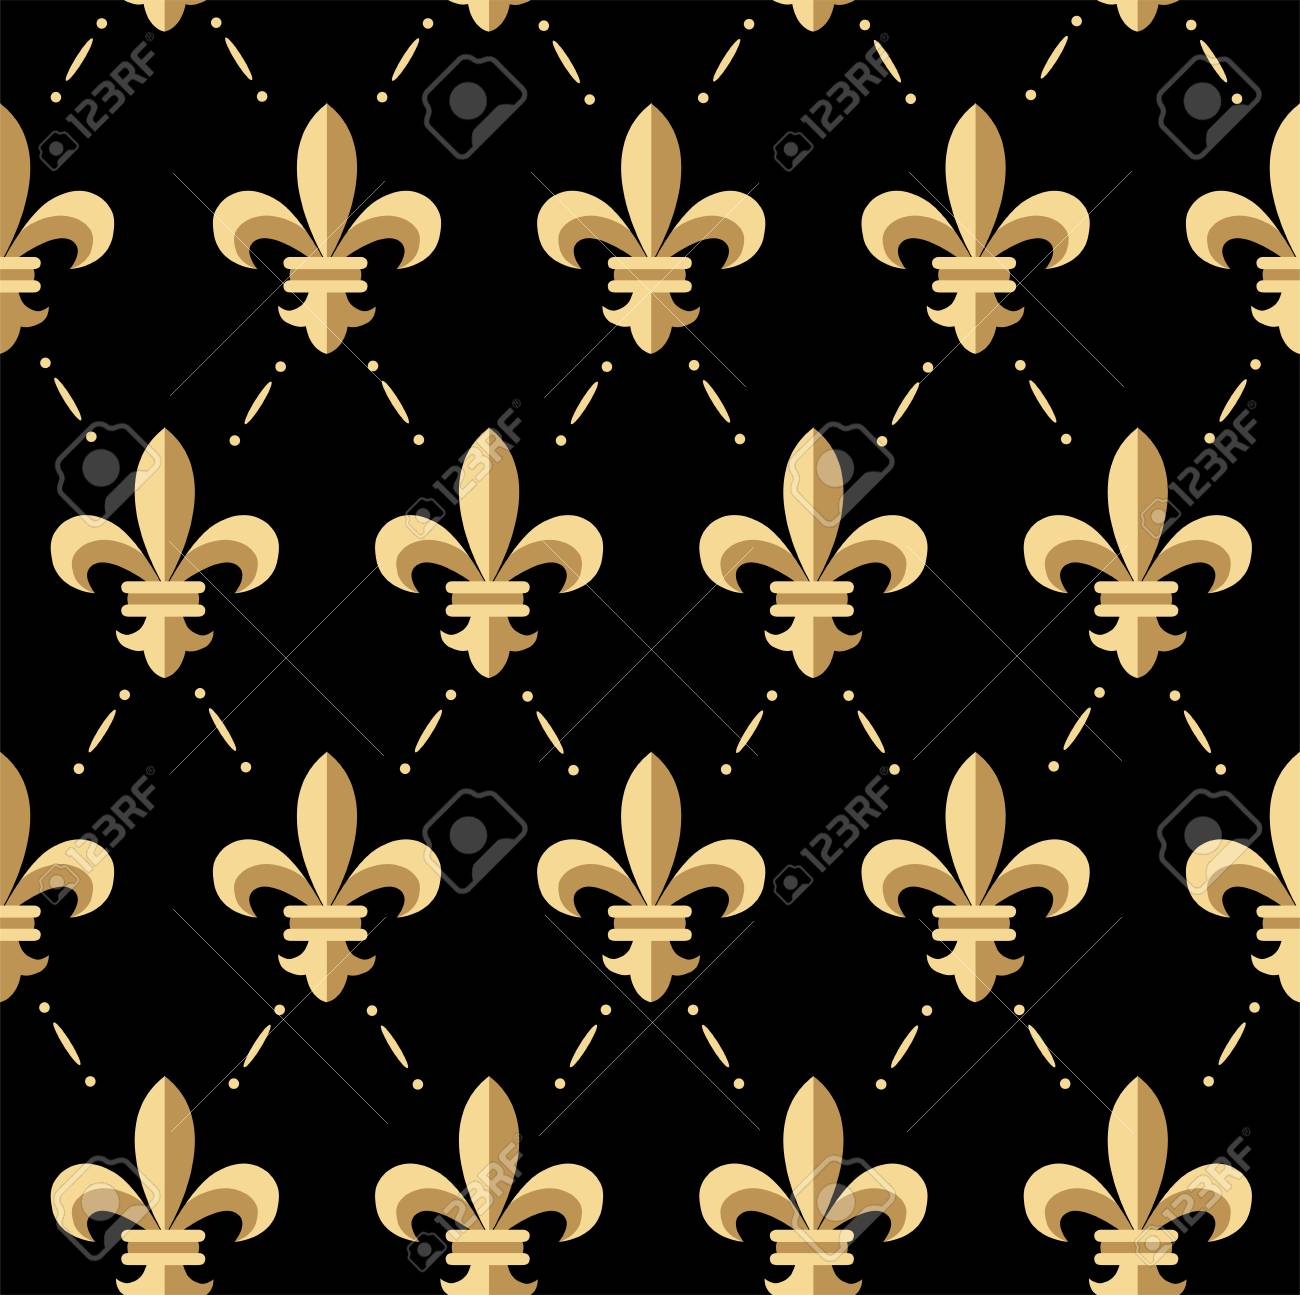 Vector Illustration Of Golden Fleur De Lis Seamless Pattern